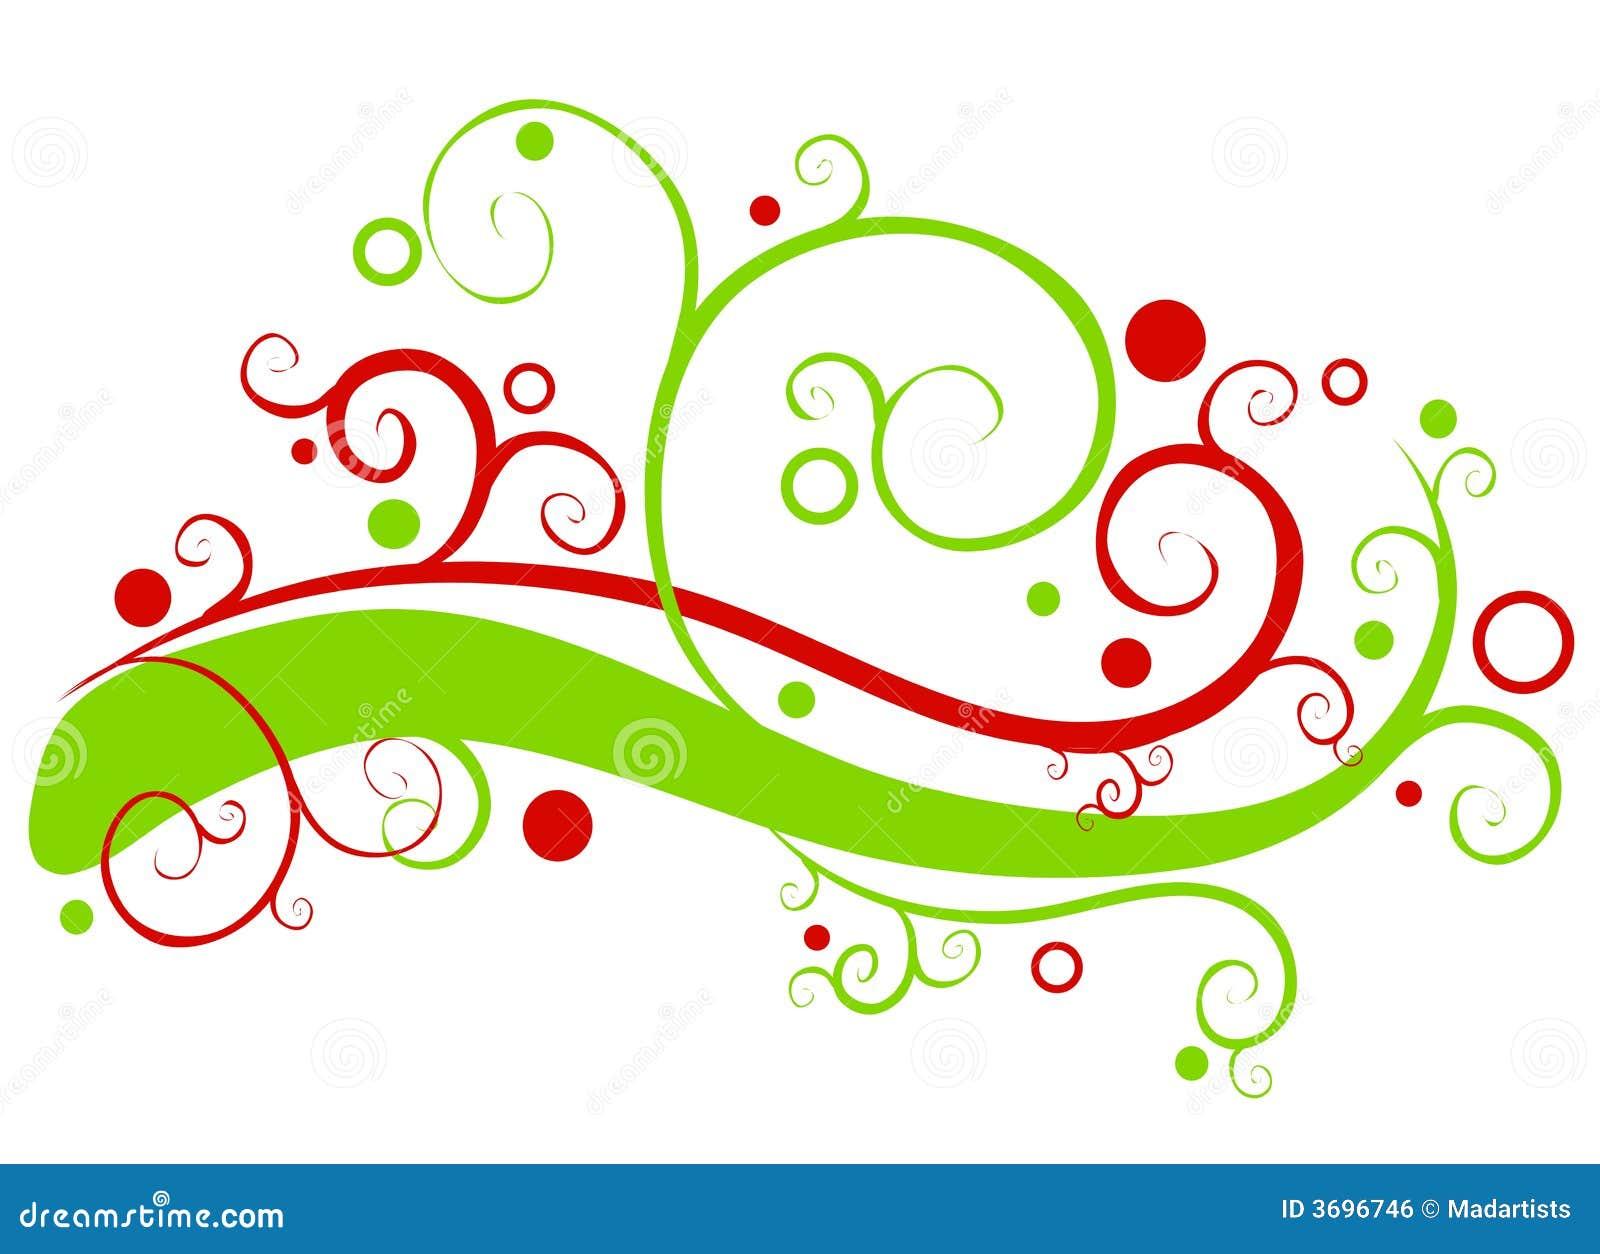 Decorative Christmas Garland Swirls Royalty Free Stock Image - Image ...